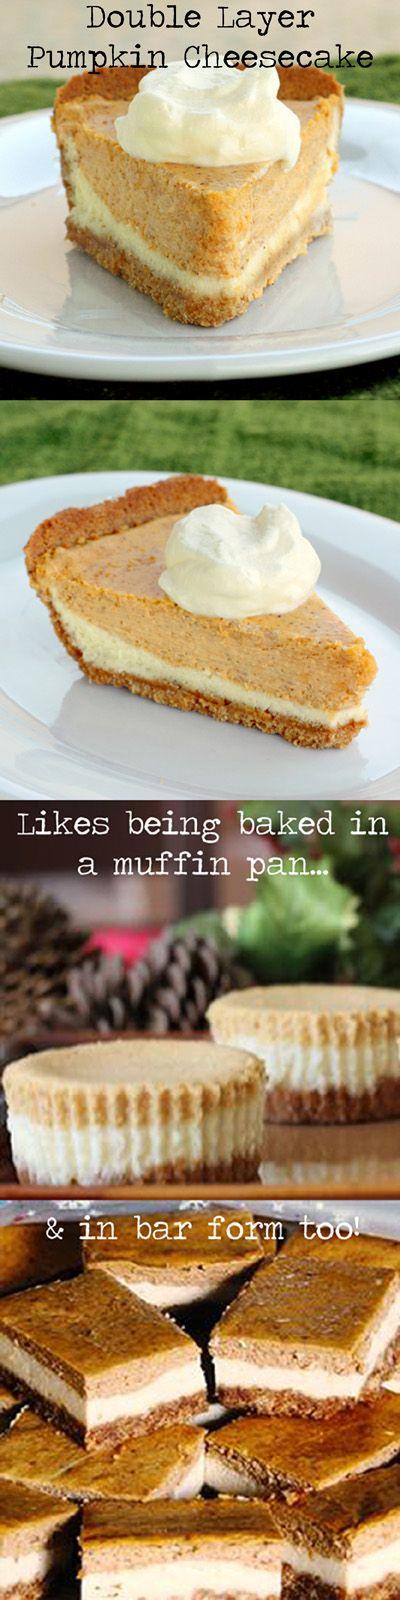 CHEESECAKE / PIE :: Double Layer Pumpkin Cheesecake :: 6 ingredients, 3 spices & 1 store-bought graham cracker crust! Half pumpkin pie, half cheesecake, ALL GOOD! Try drizzling with caramel sauce!   #cheesecake #pumpkinpie